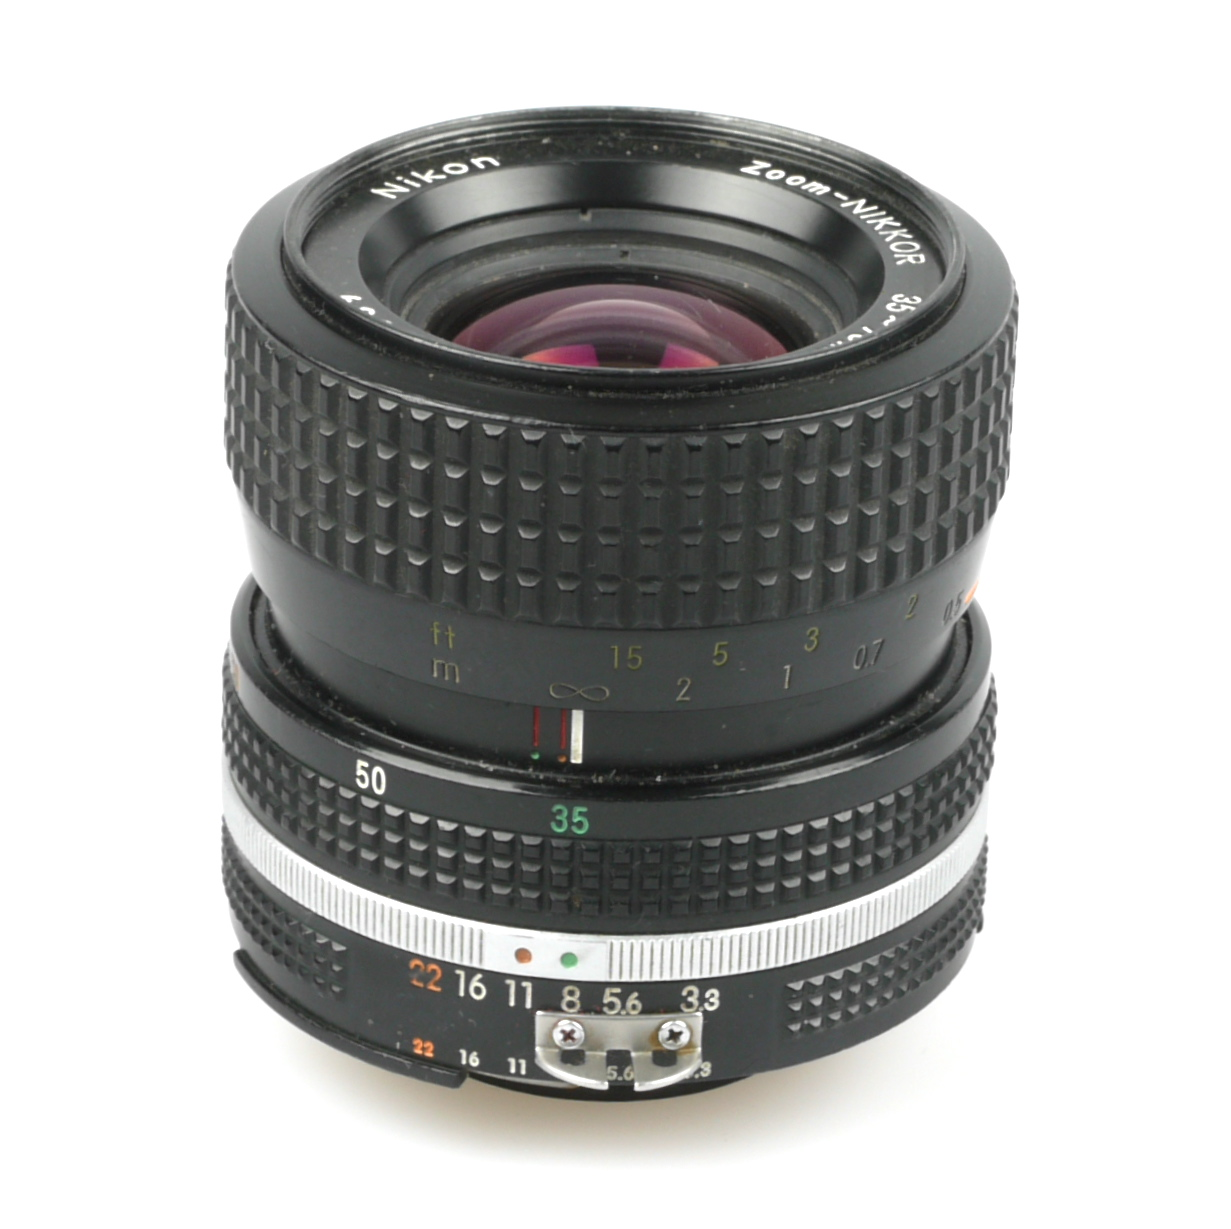 Nikkor Zoom 35-70 f/3.5-4.5 (1983)